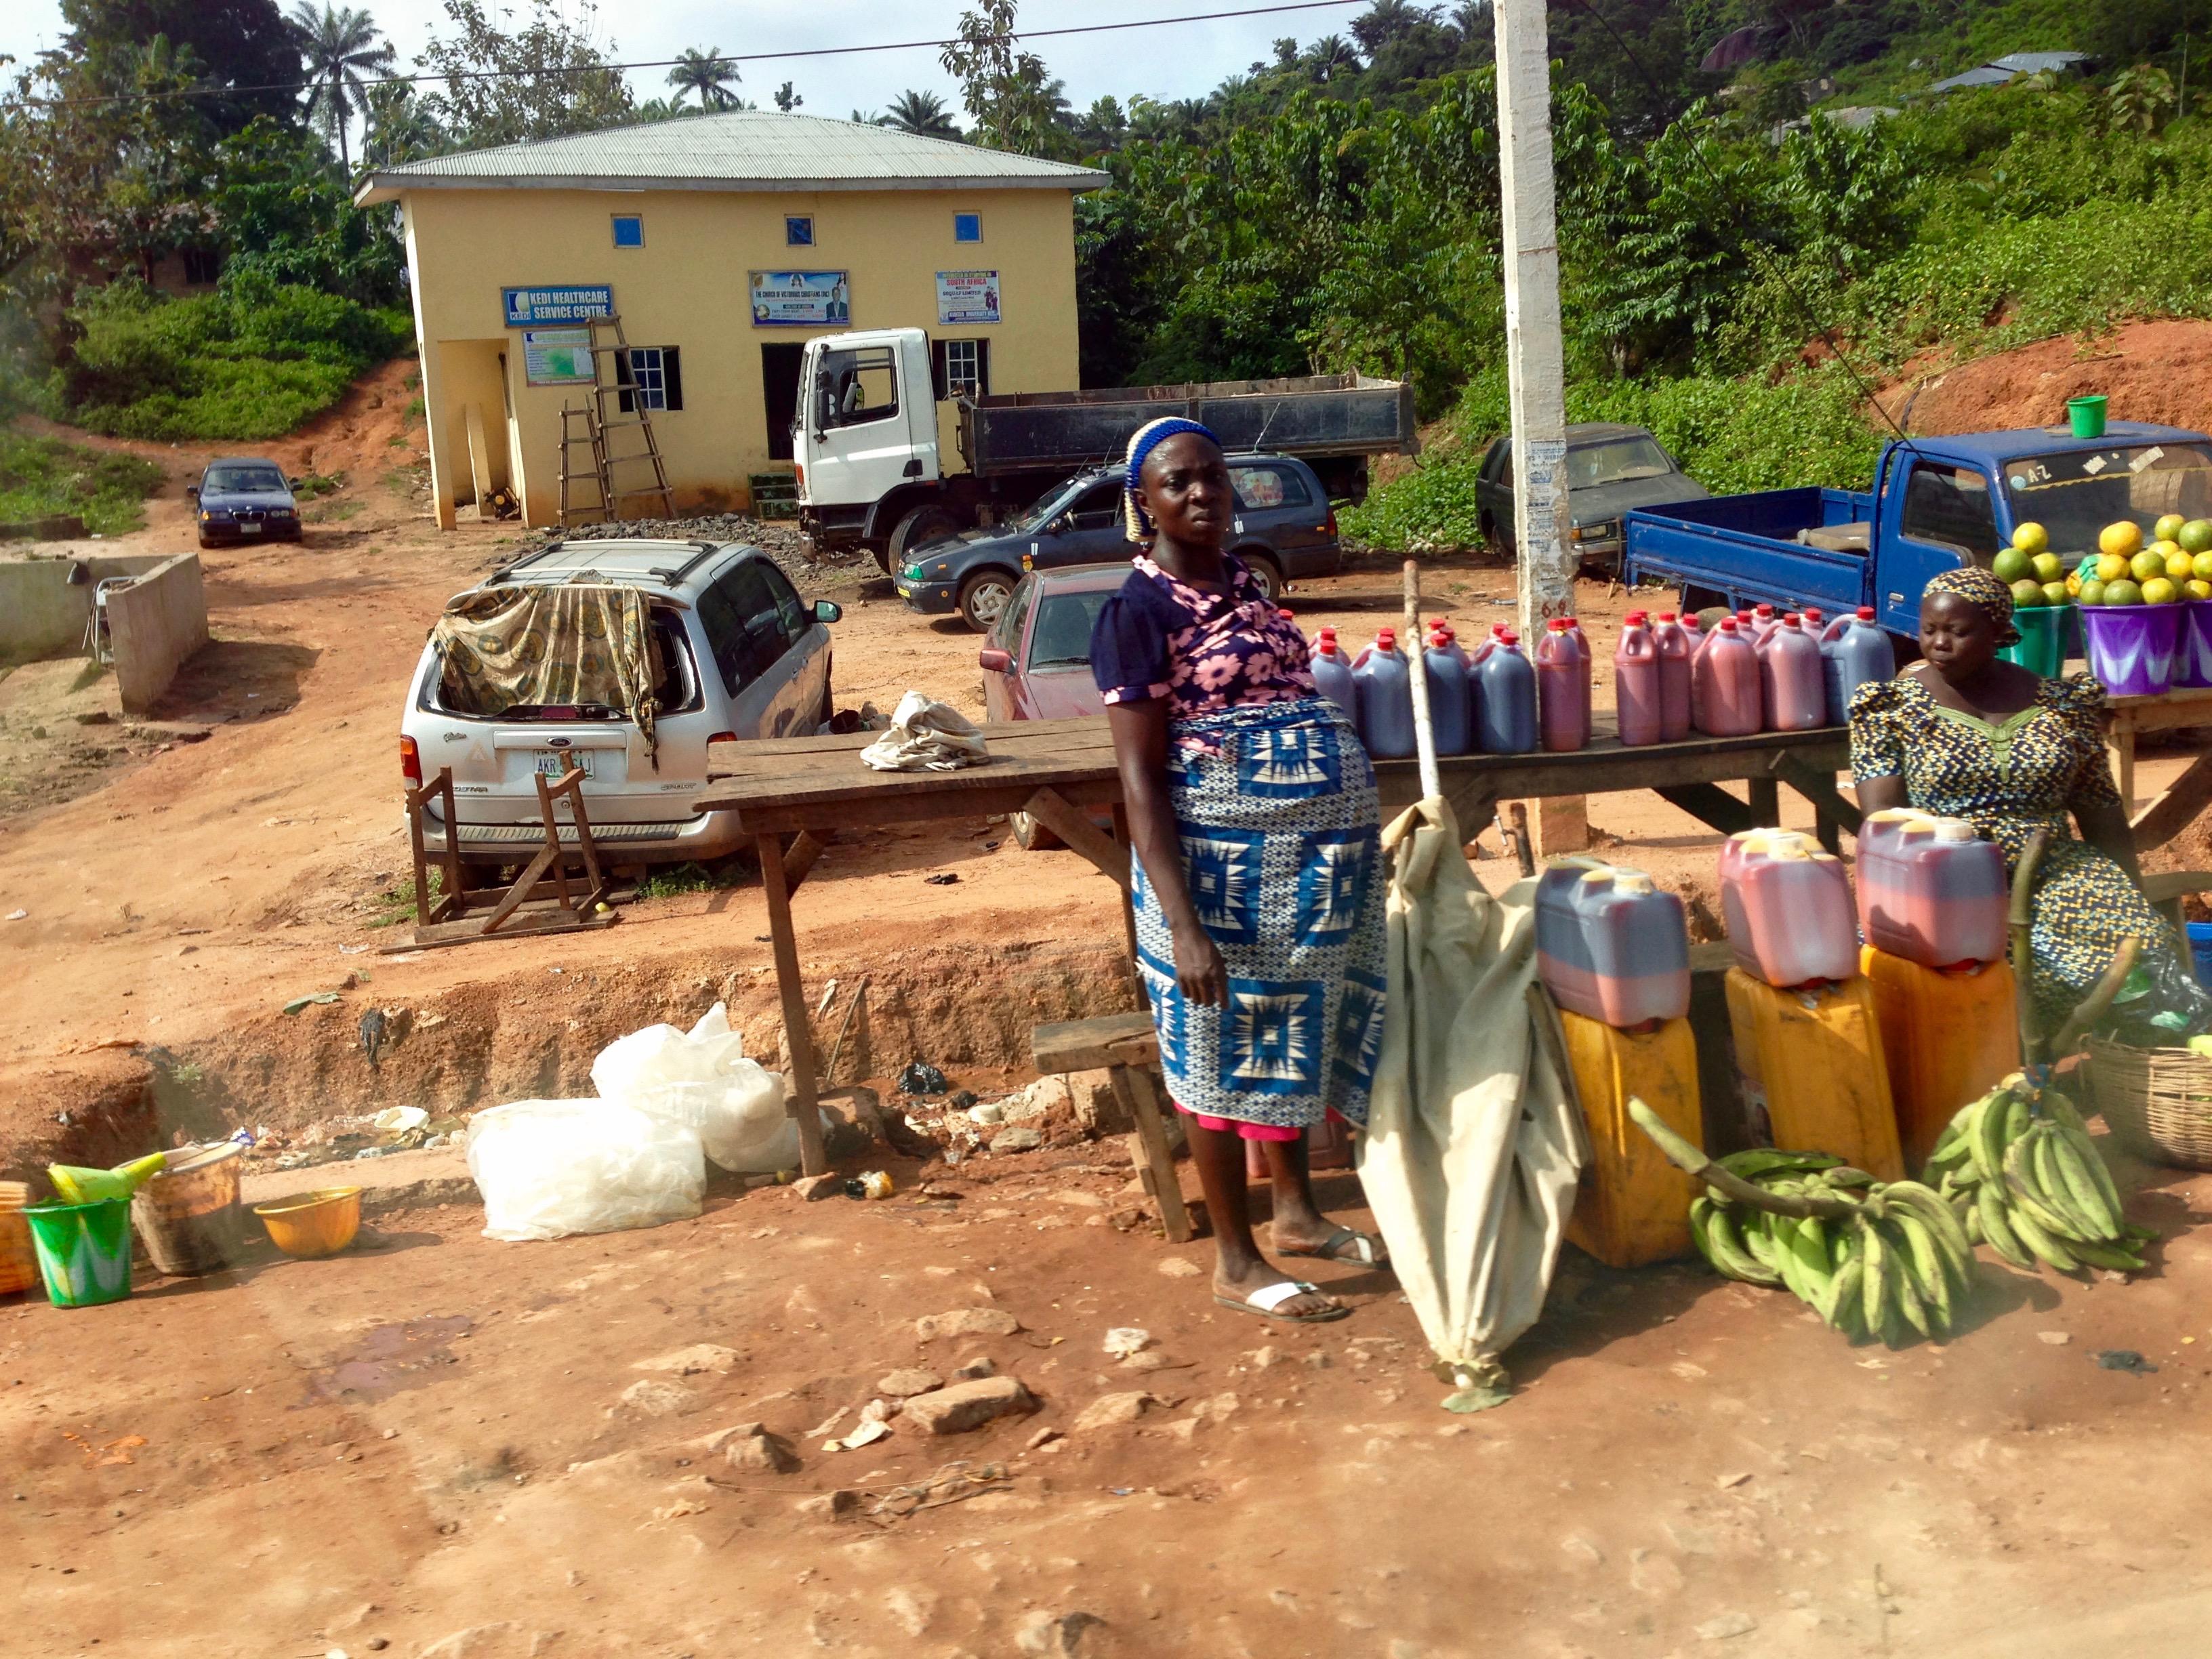 Roadside market scene in Igbara Oke, Ondo, Nigeria.